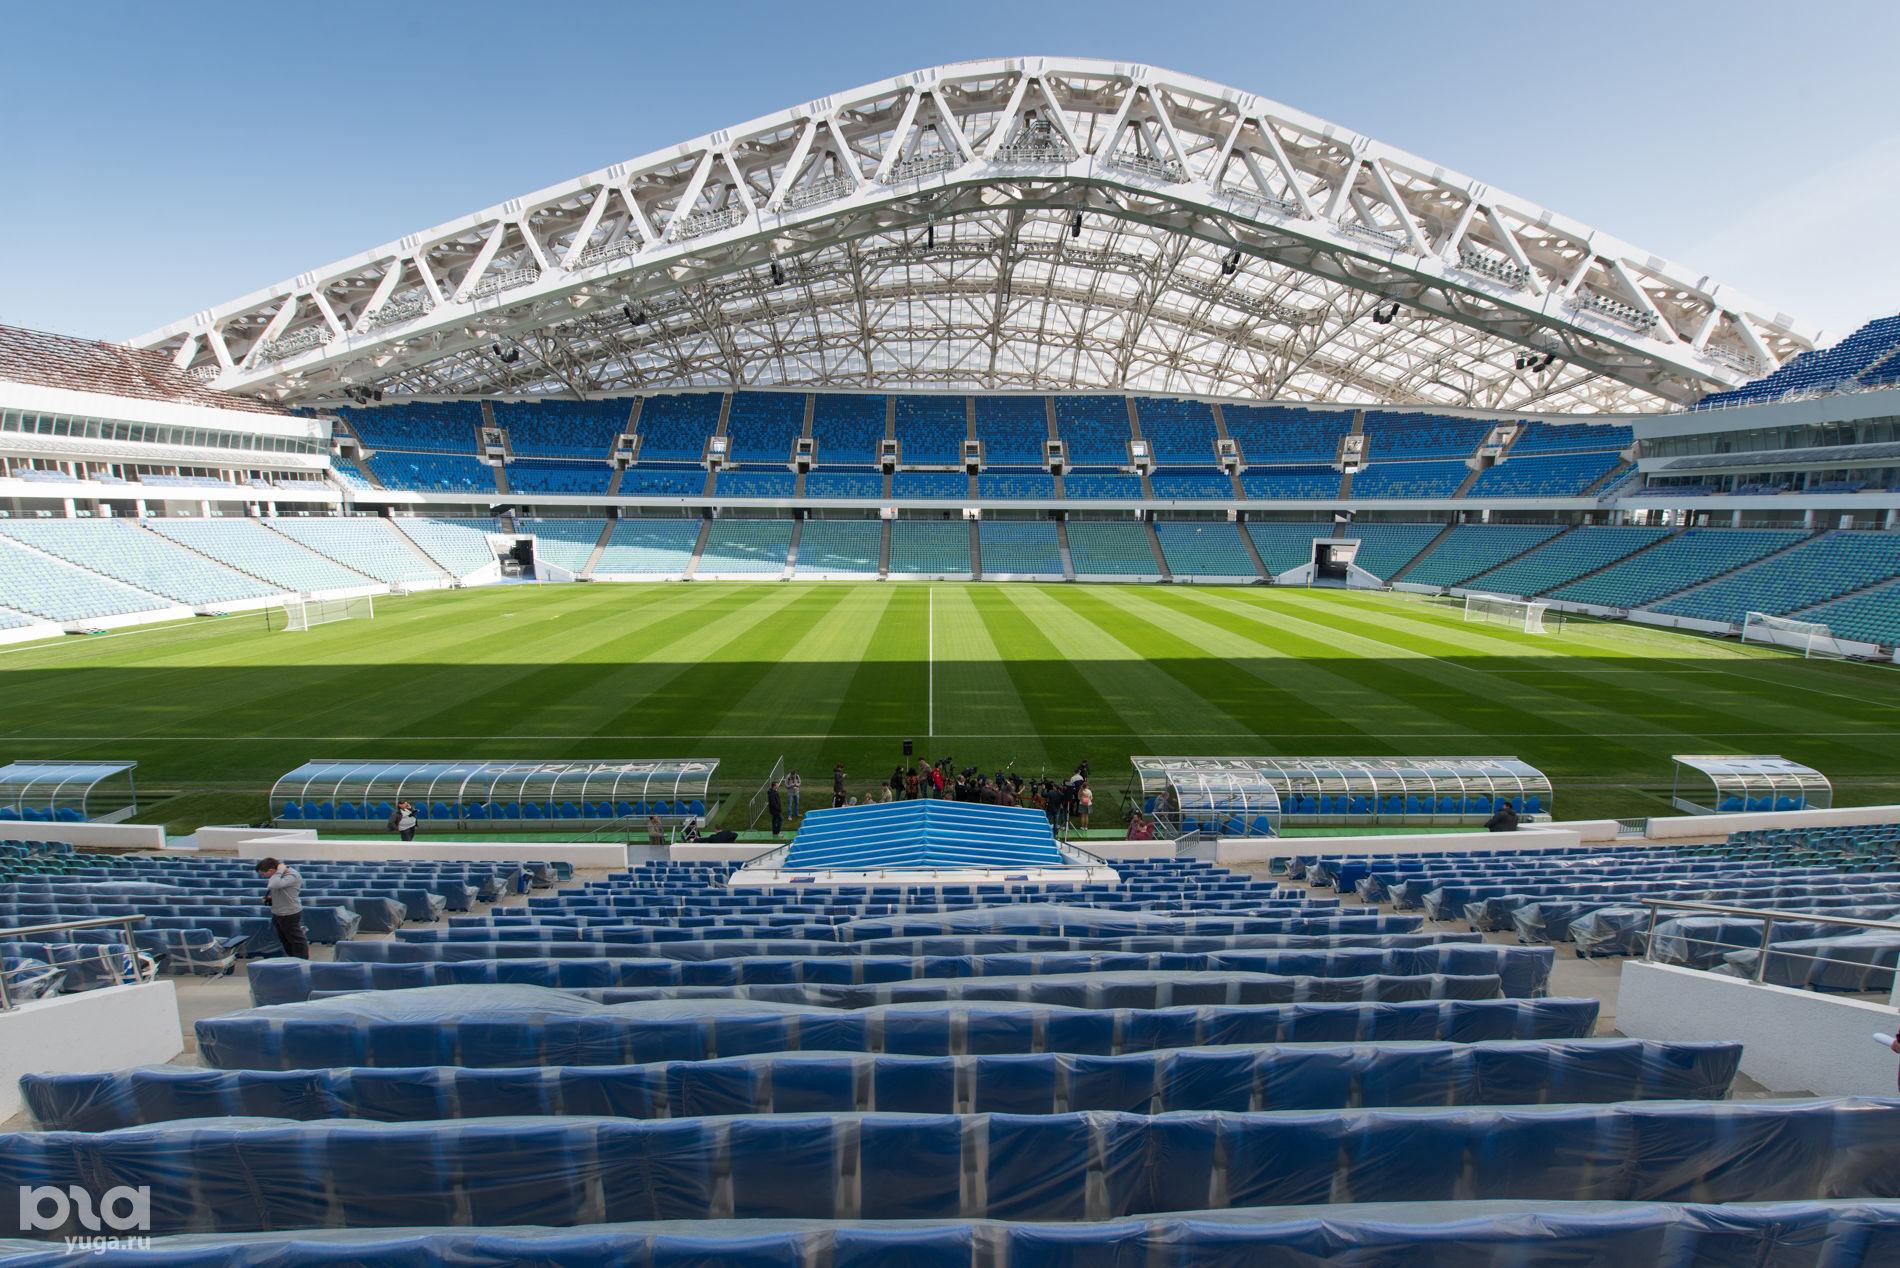 Стадион «Фишт» ©Фото Никиты Быкова, Юга.ру